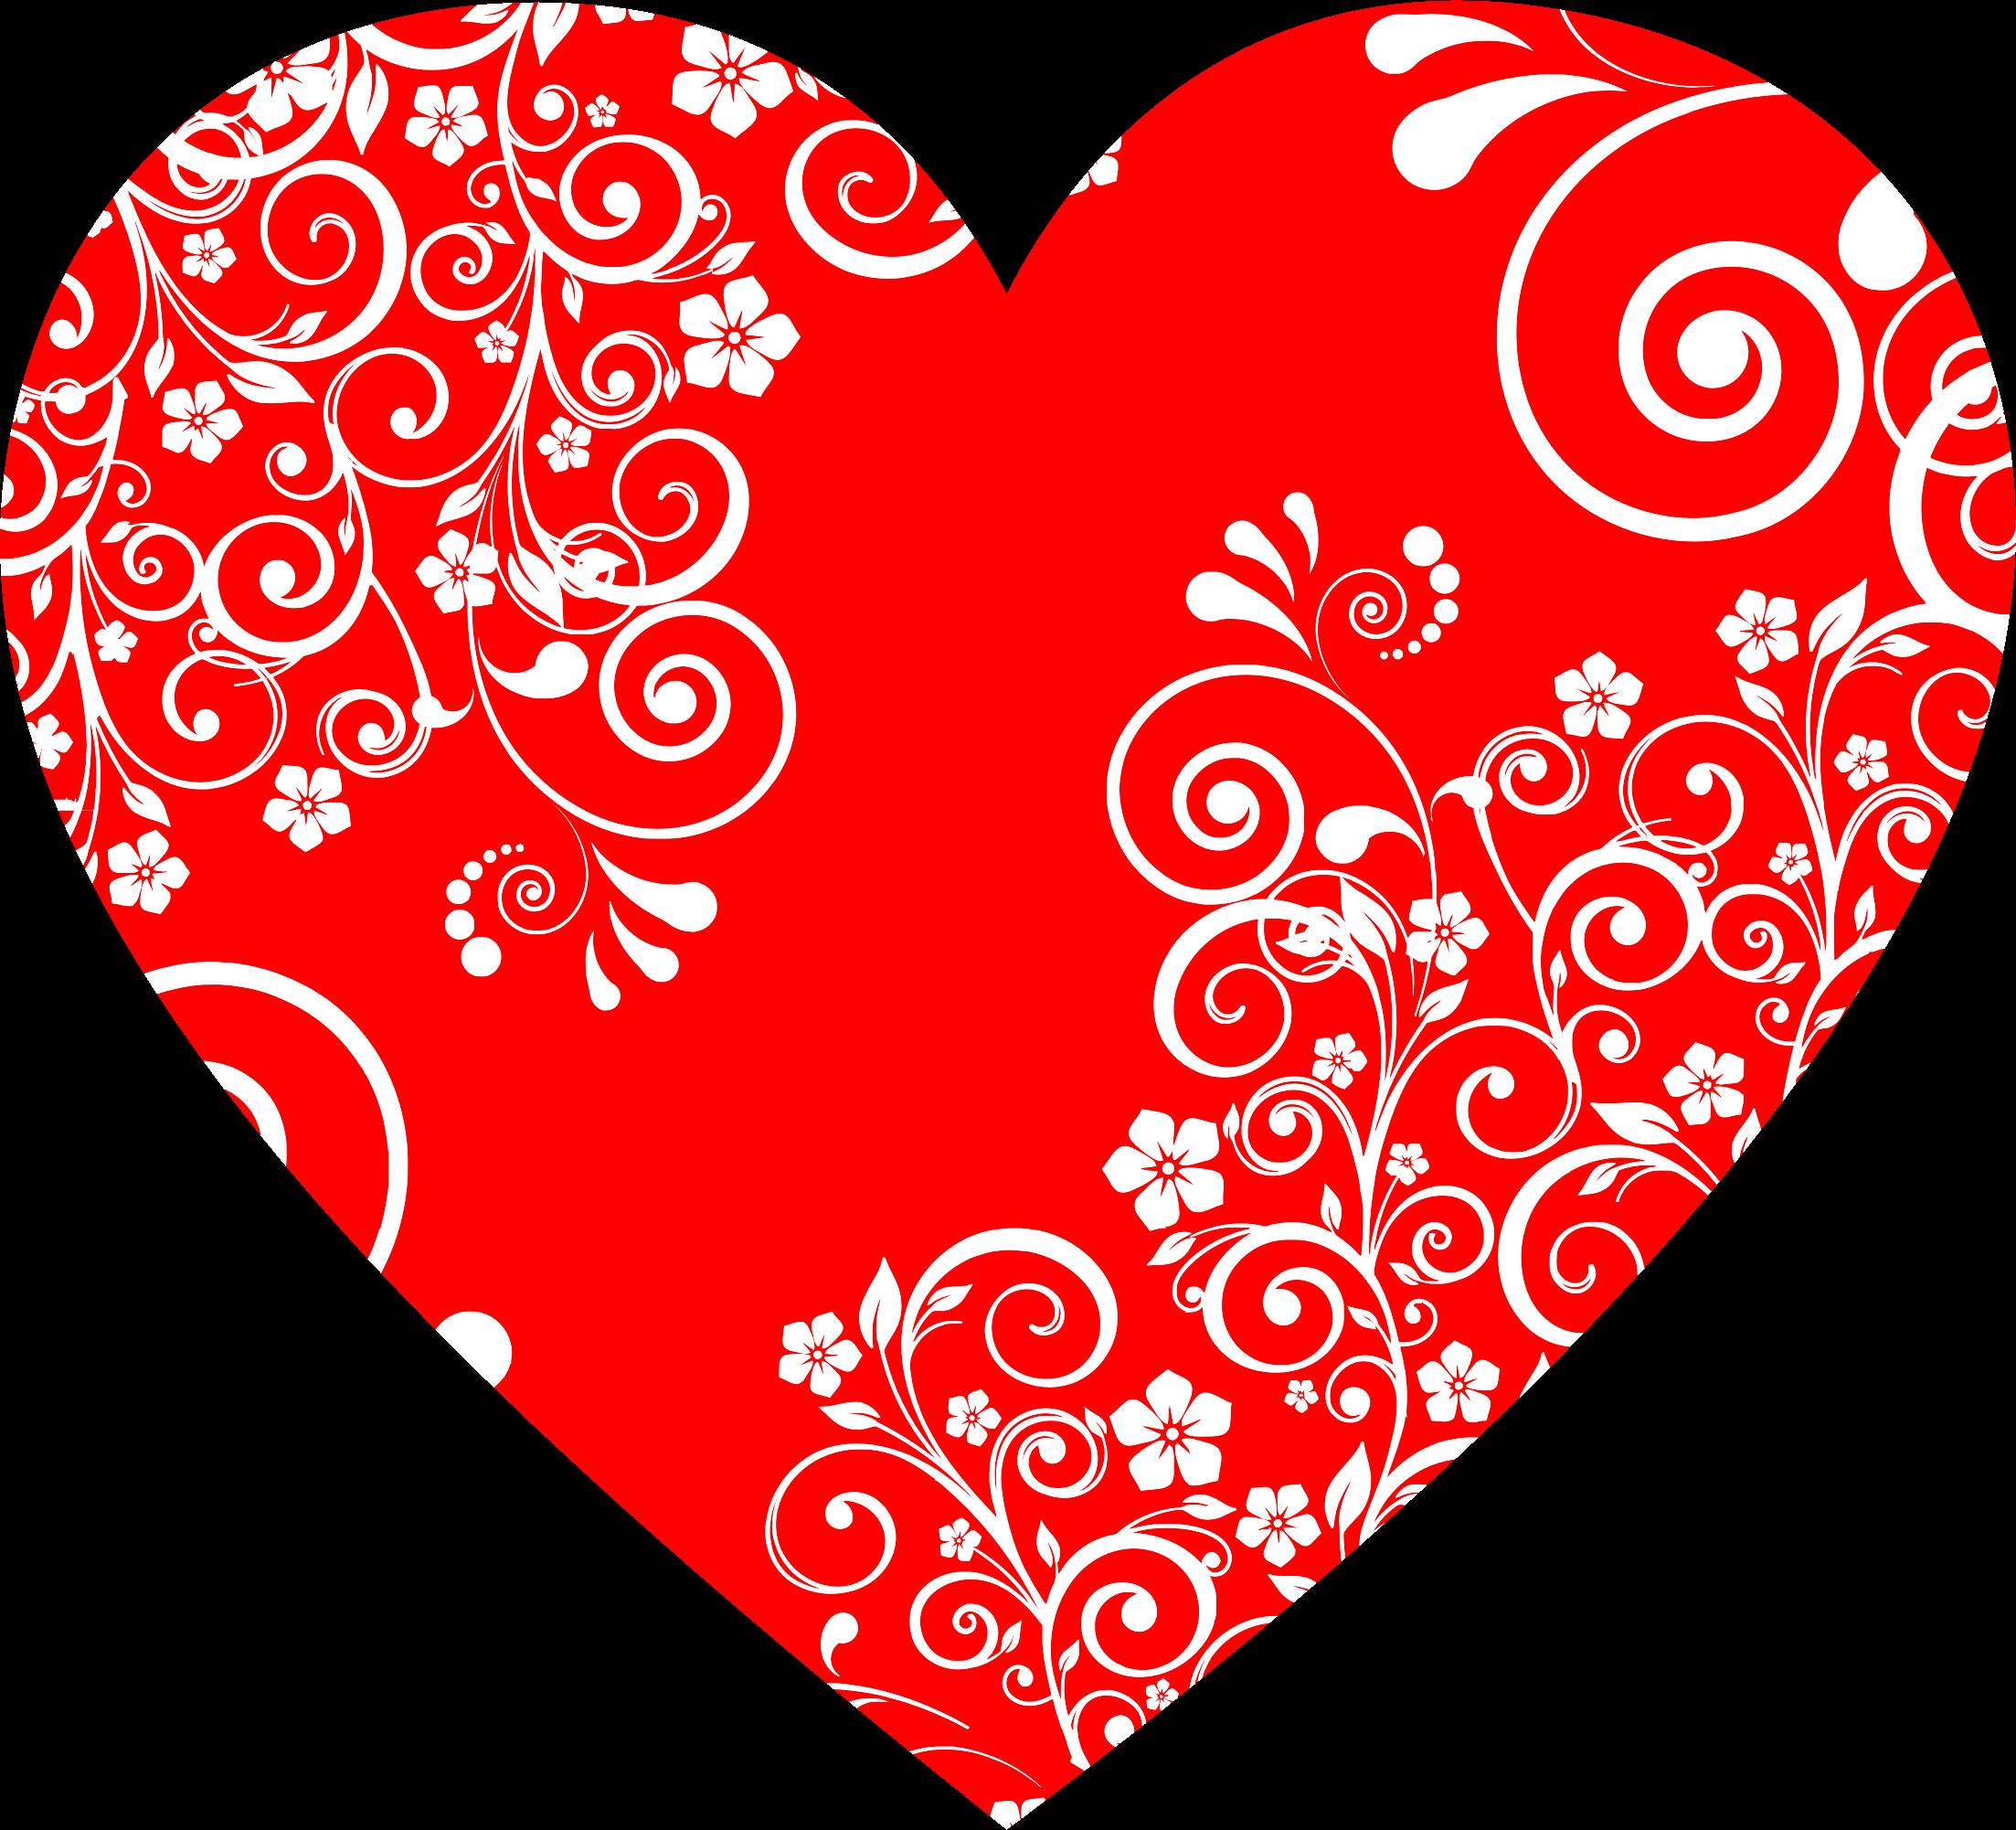 Flourish heart clipart banner library stock Clipart - Floral Flourish Heart 2 banner library stock